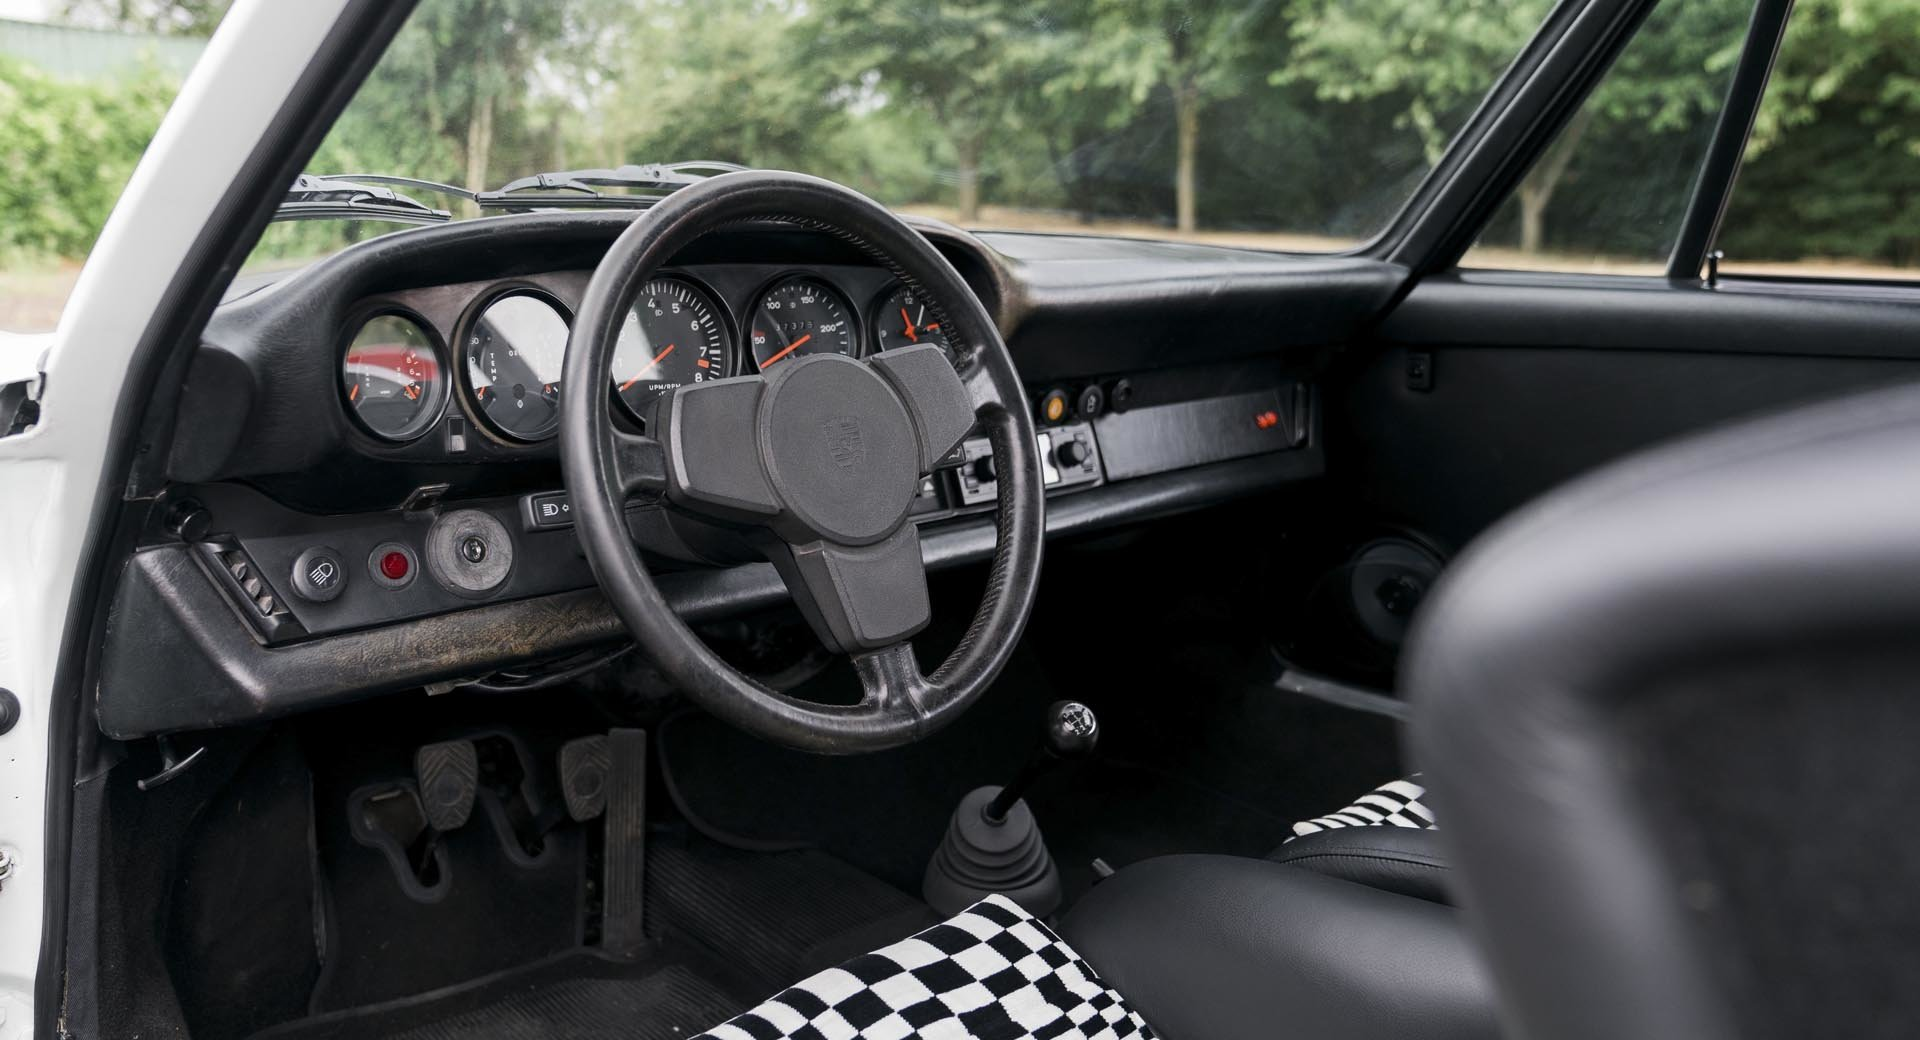 1974 Porsche 911 2.7 MFI SOLD (picture 3 of 6)